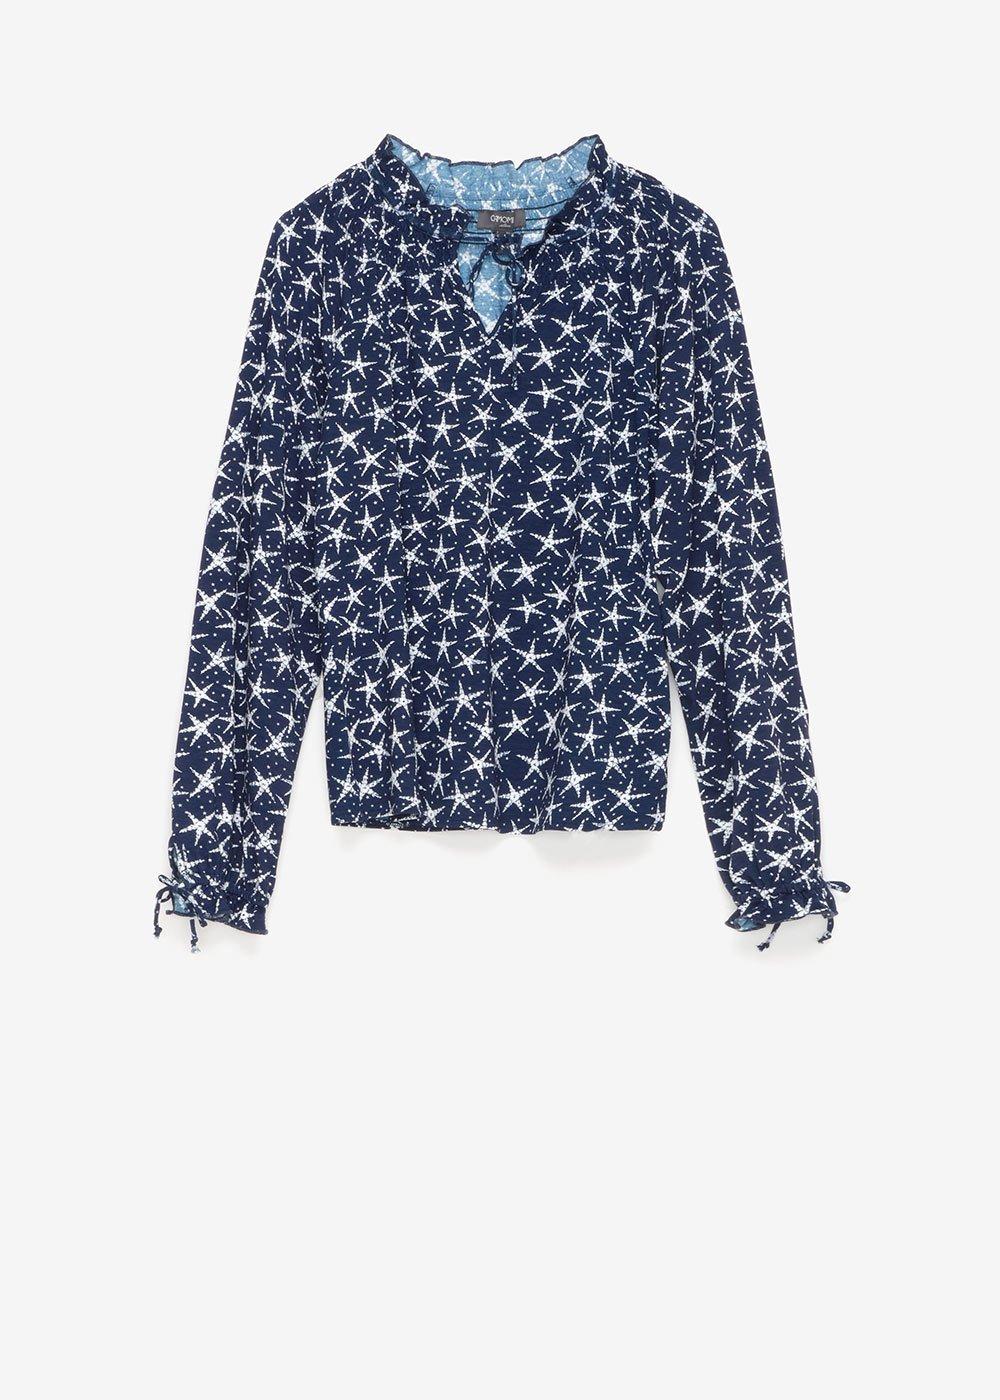 Susan t-shirt with star pattern - Blue / White / Multi - Woman